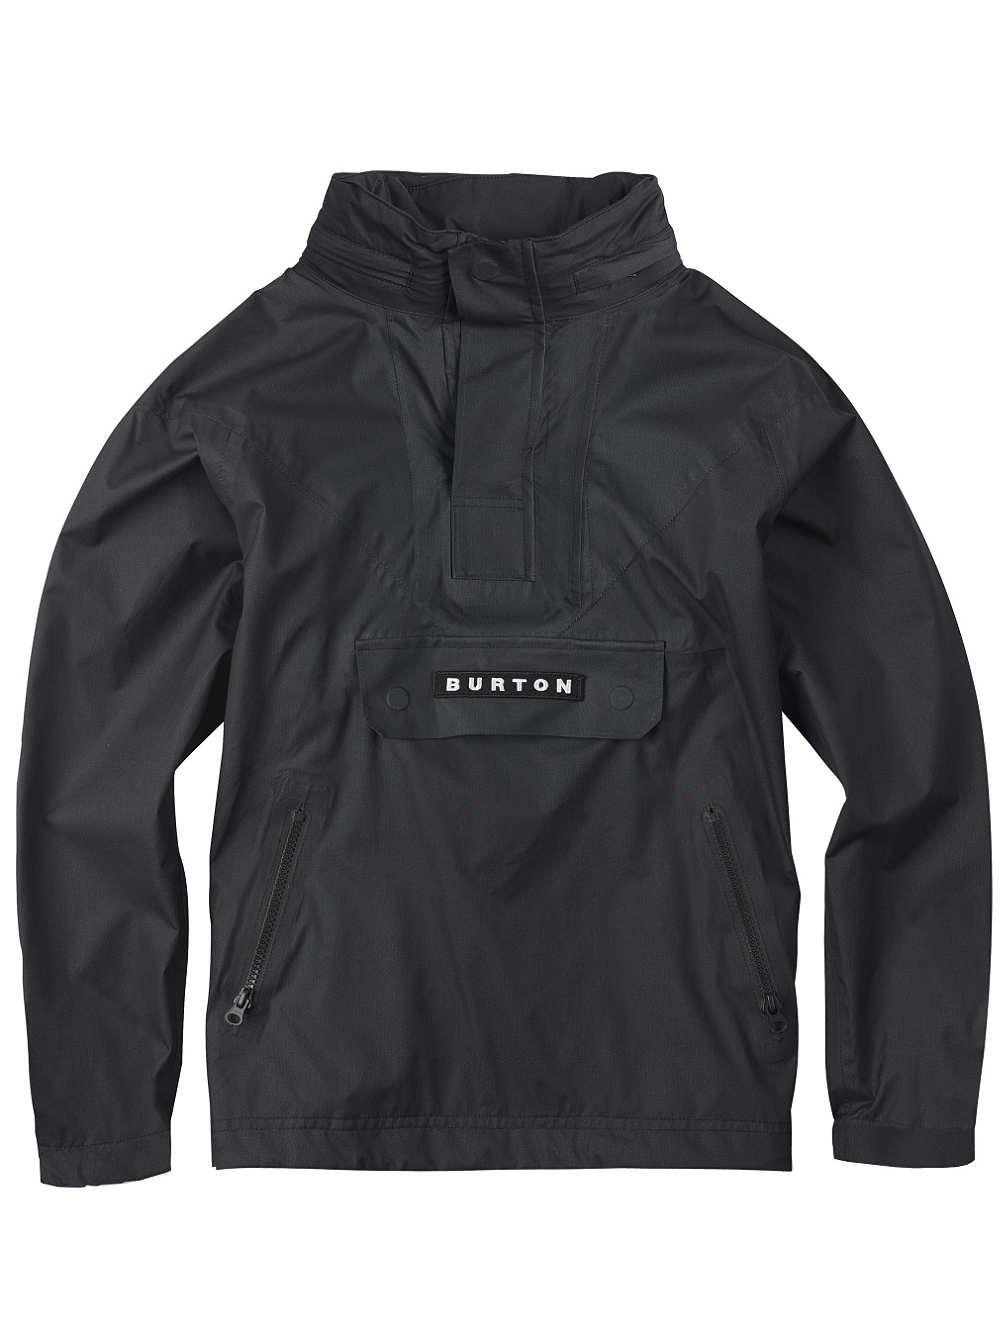 Burton Herren Jacke PS Frlight Jacket kaufen